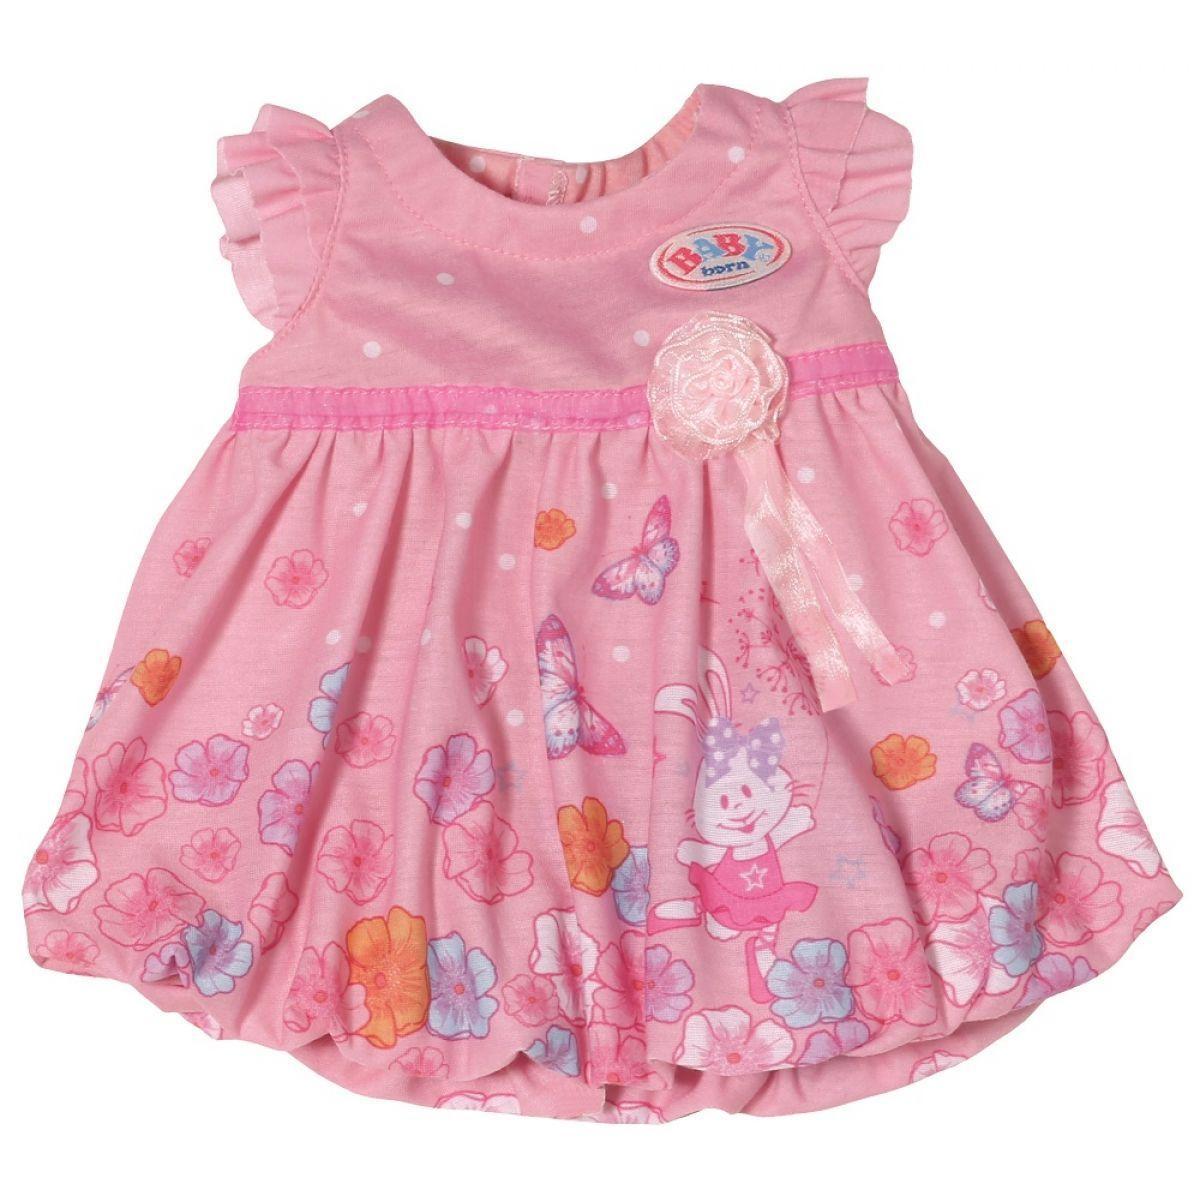 BABY born Одежда для куклы 43 см, платье